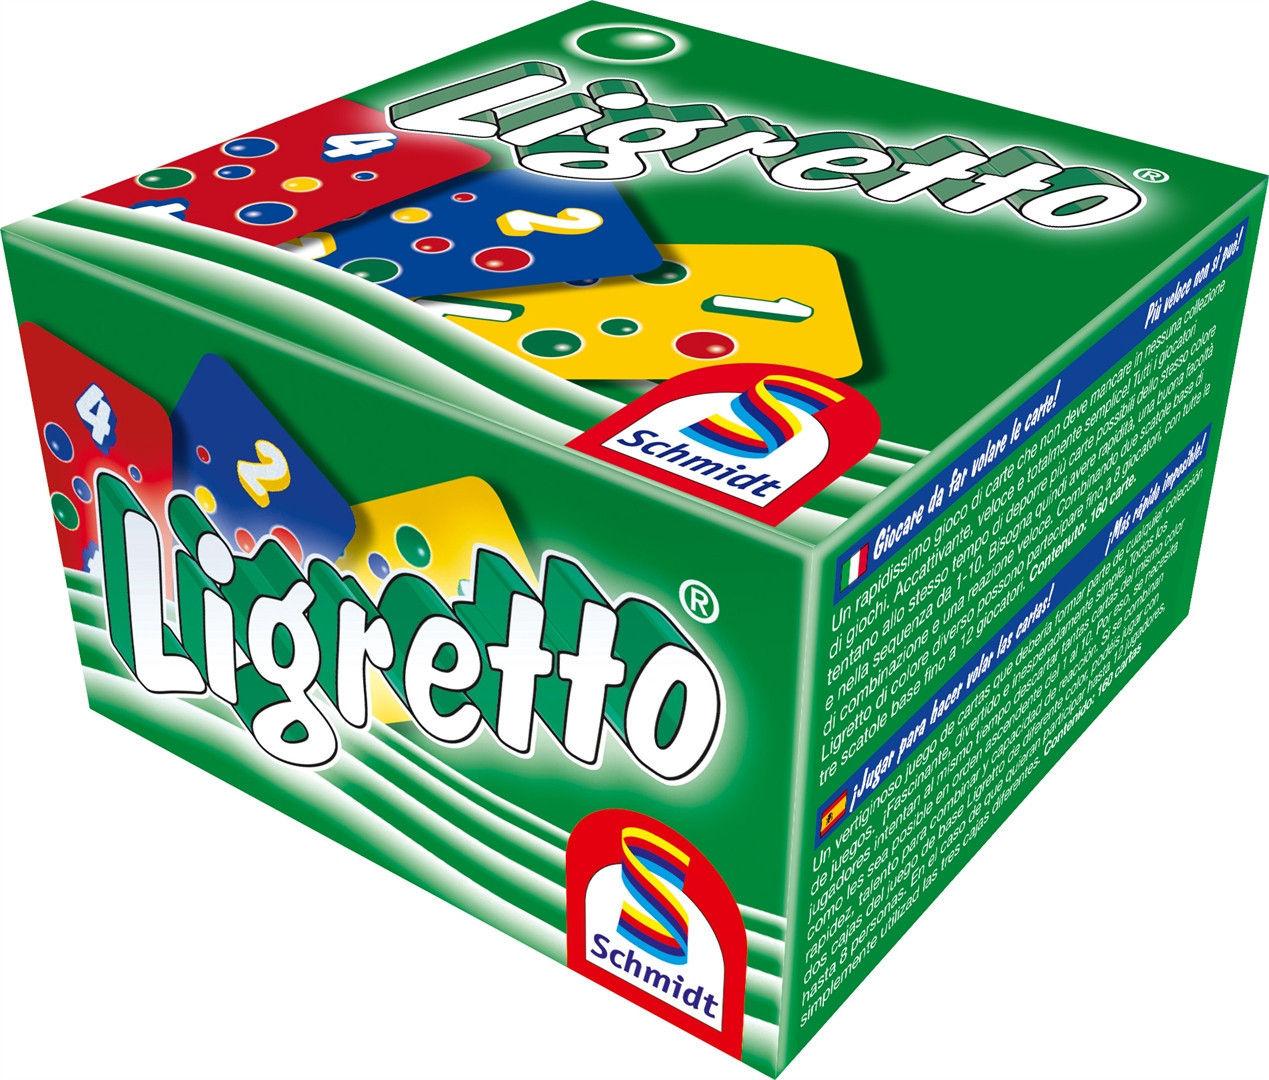 Brain Games Ligretto zaļais, green Baltic galda spēle